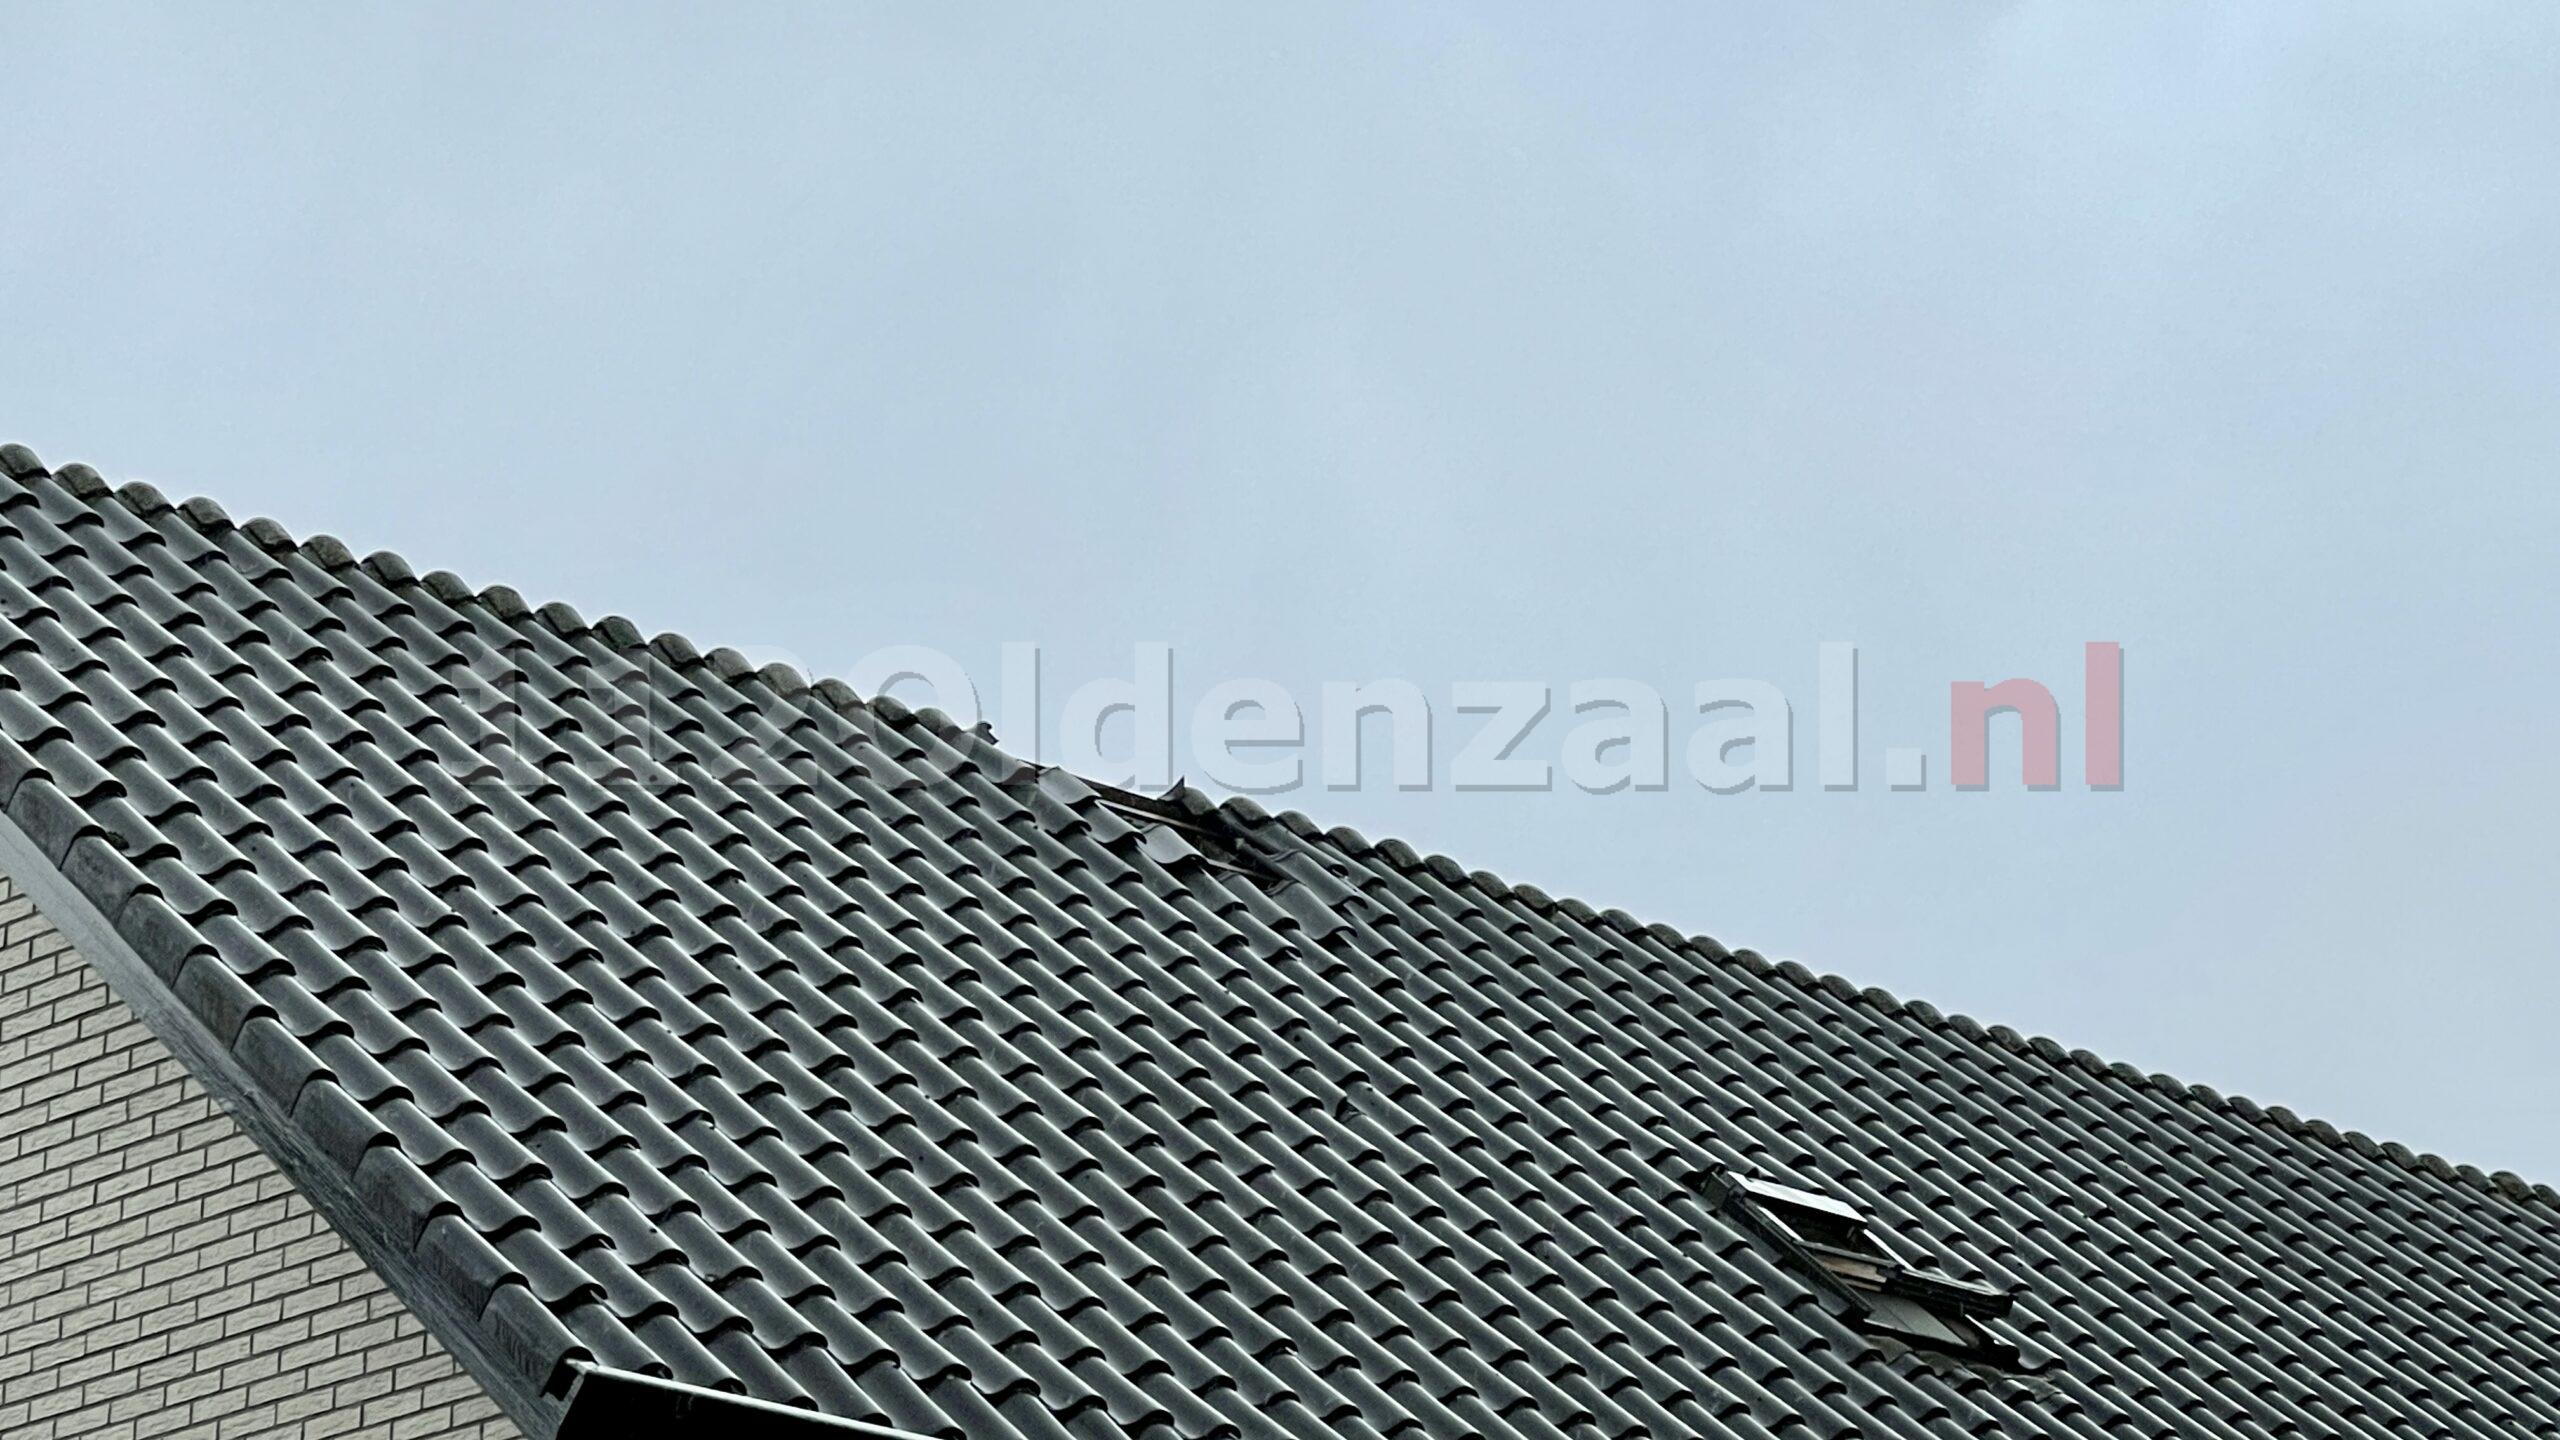 Bliksem ingeslagen in woning Oldenzaal